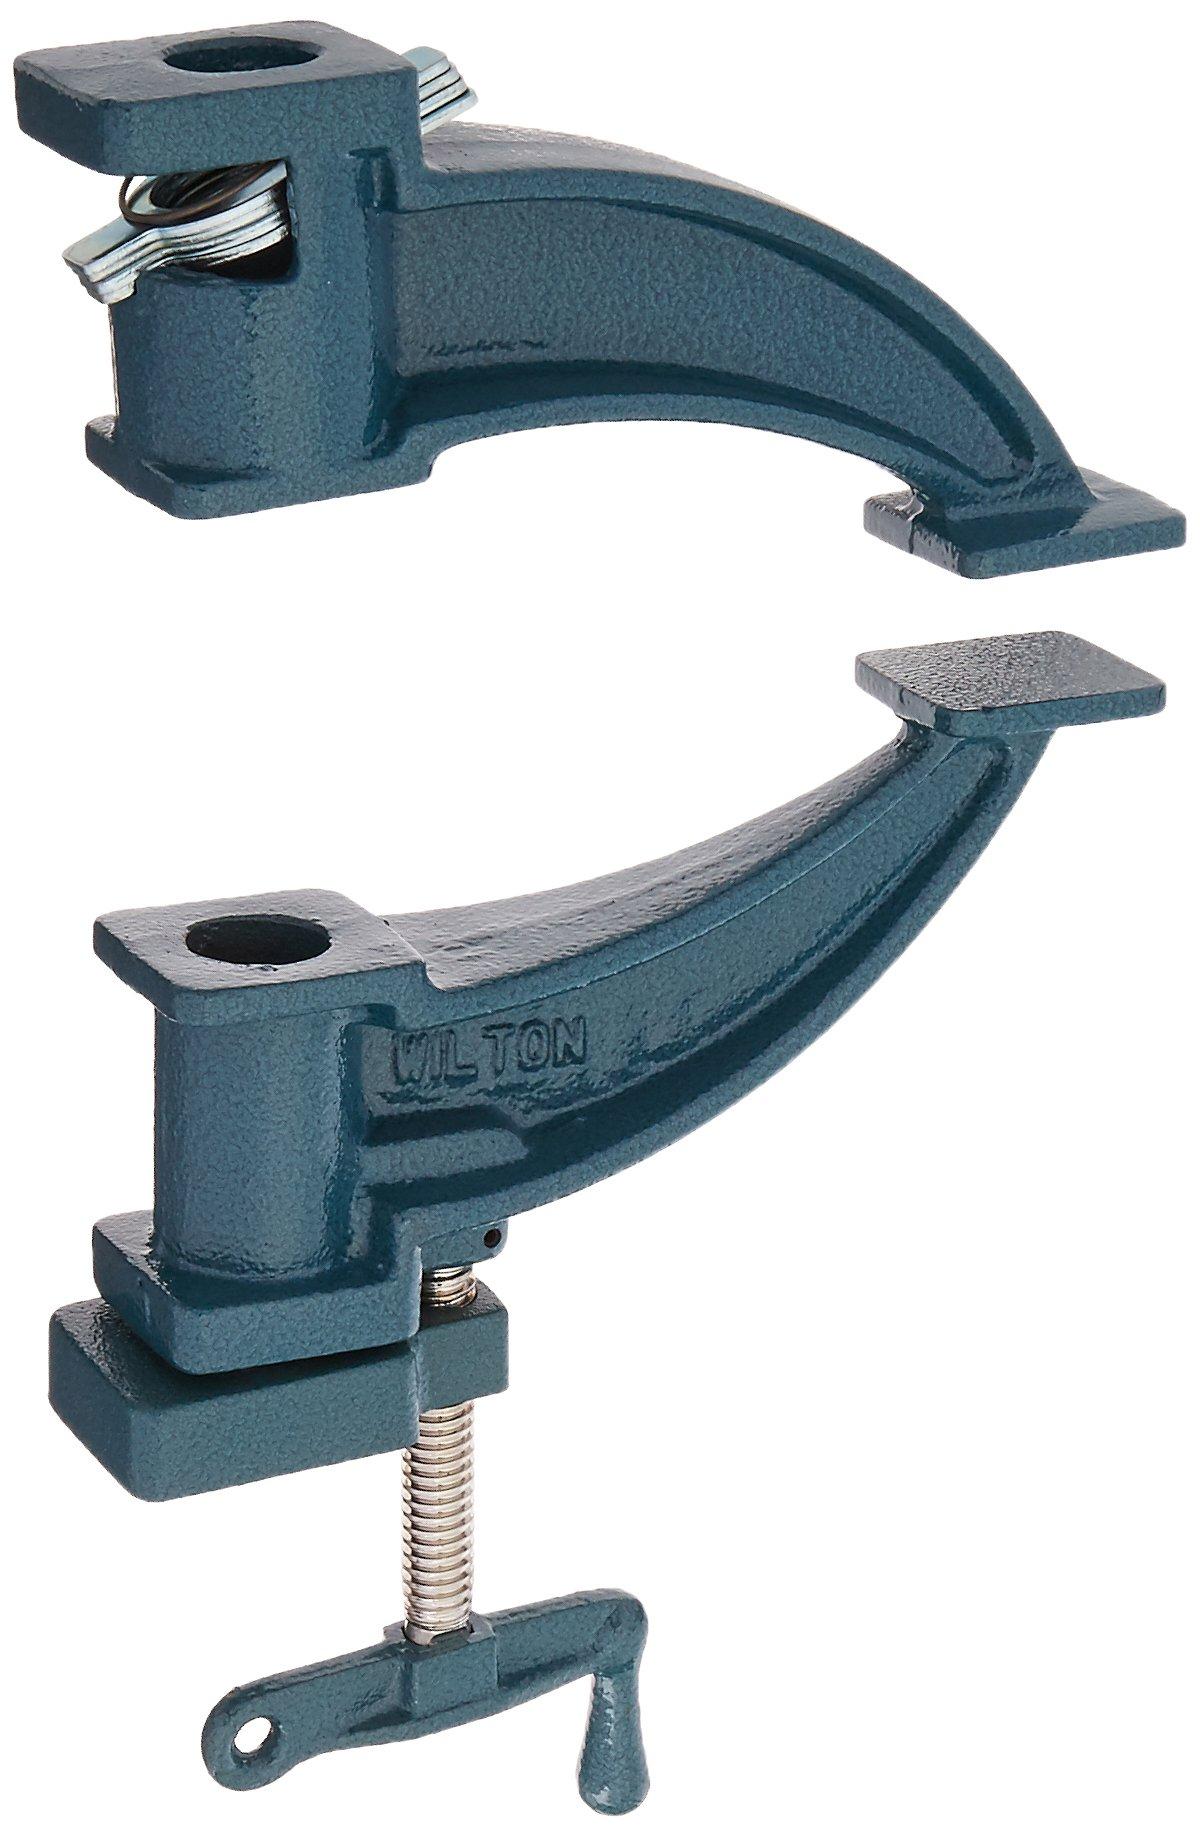 Wilton 14870 530, Steel Pipe Clamp Fixture, Deep-Throat, 3/4-Inch Threaded Pipe